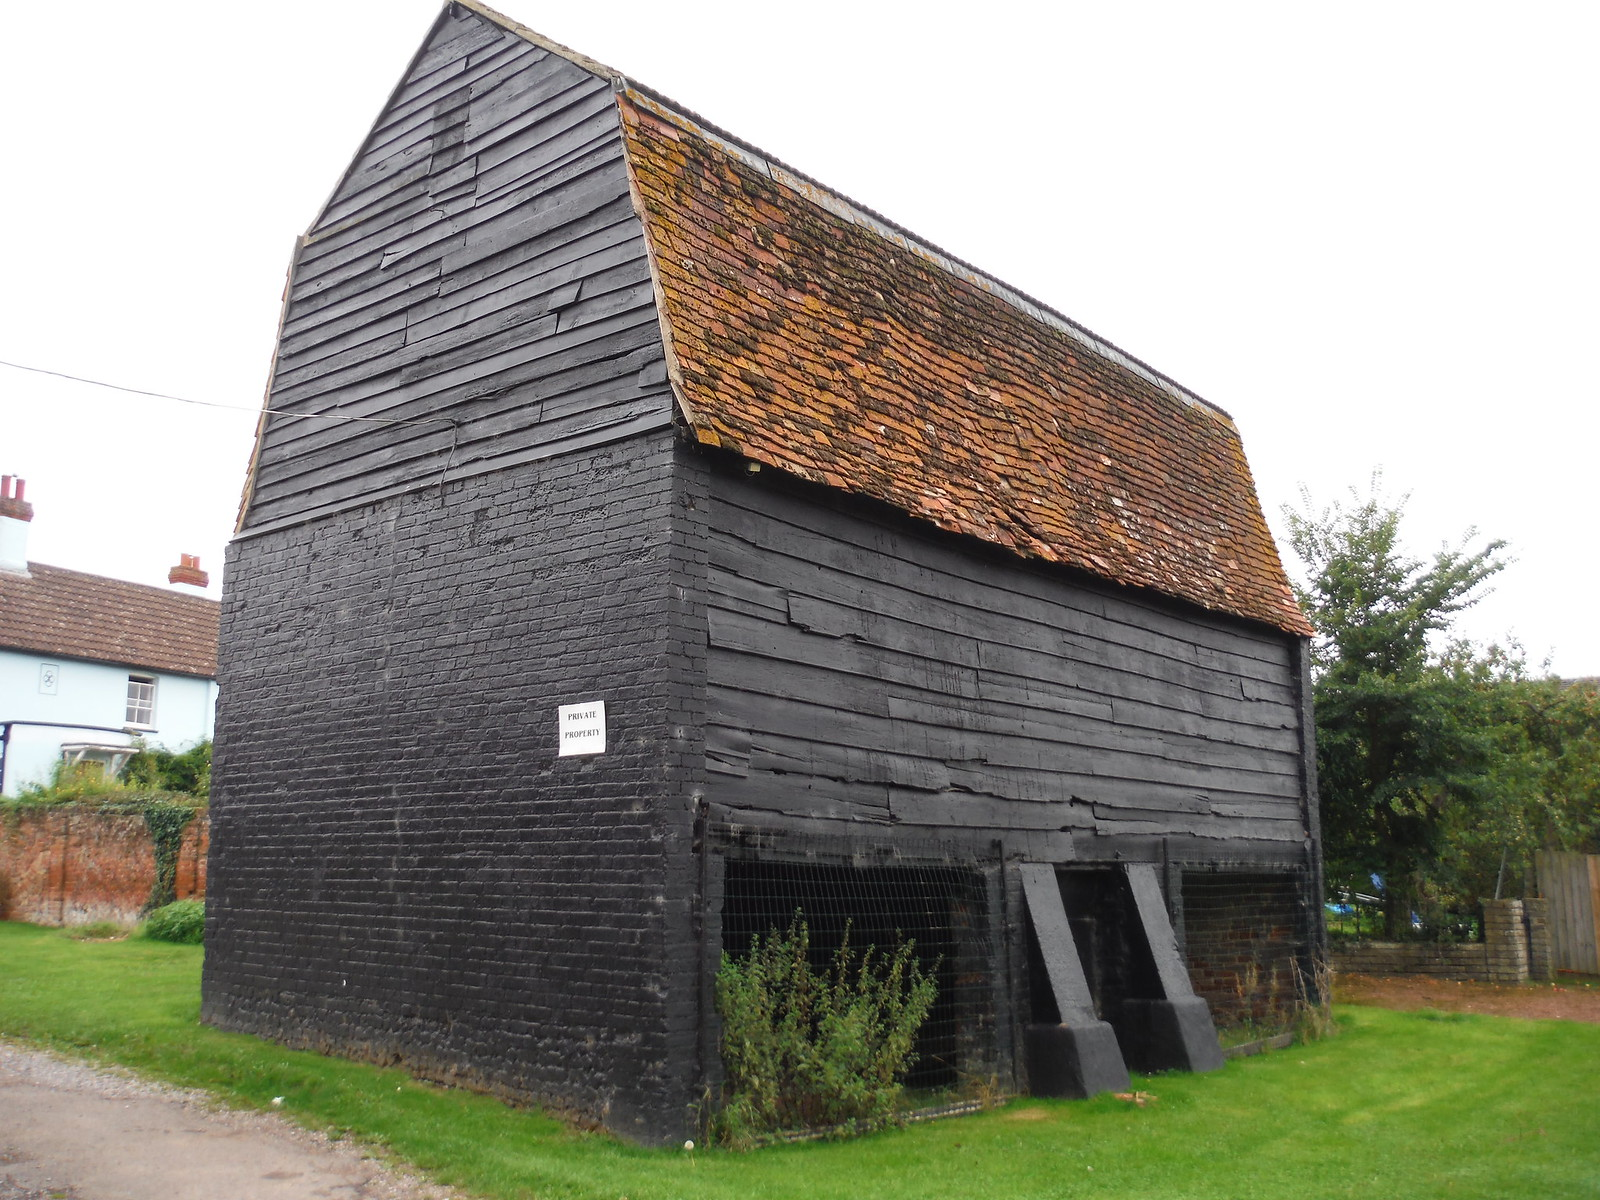 Barn, Sawbridgeworth SWC Walk 164 Roydon to Sawbridgeworth via Henry Moore Foundation